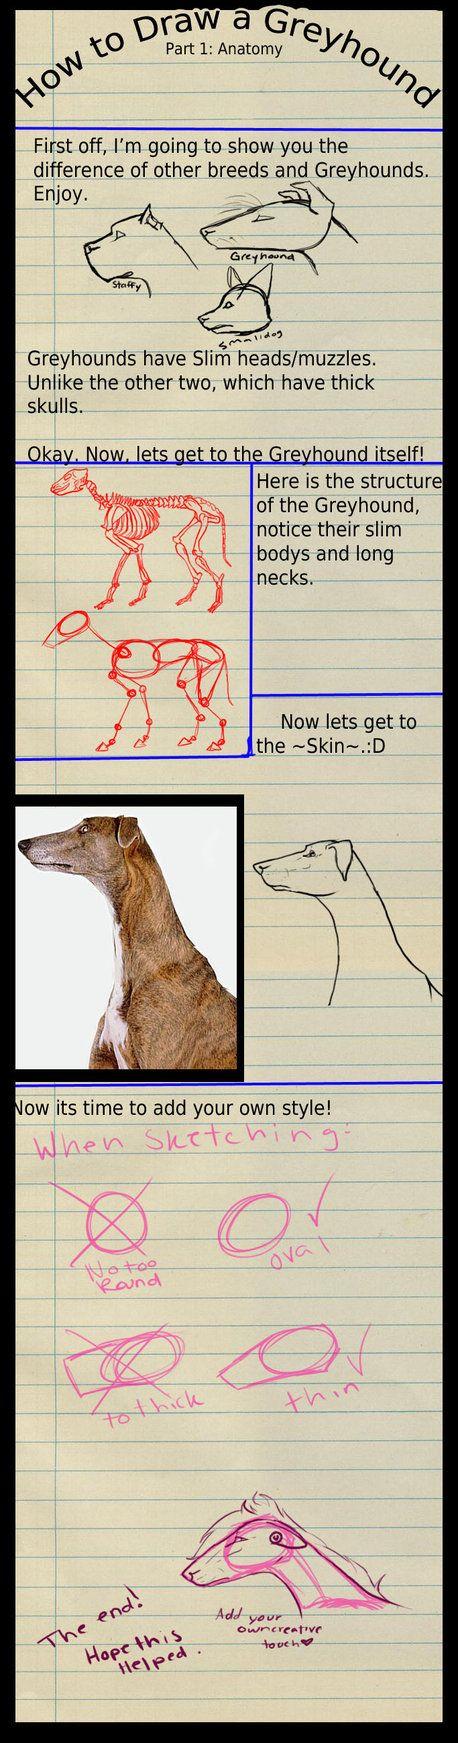 How To Draw A Greyhound